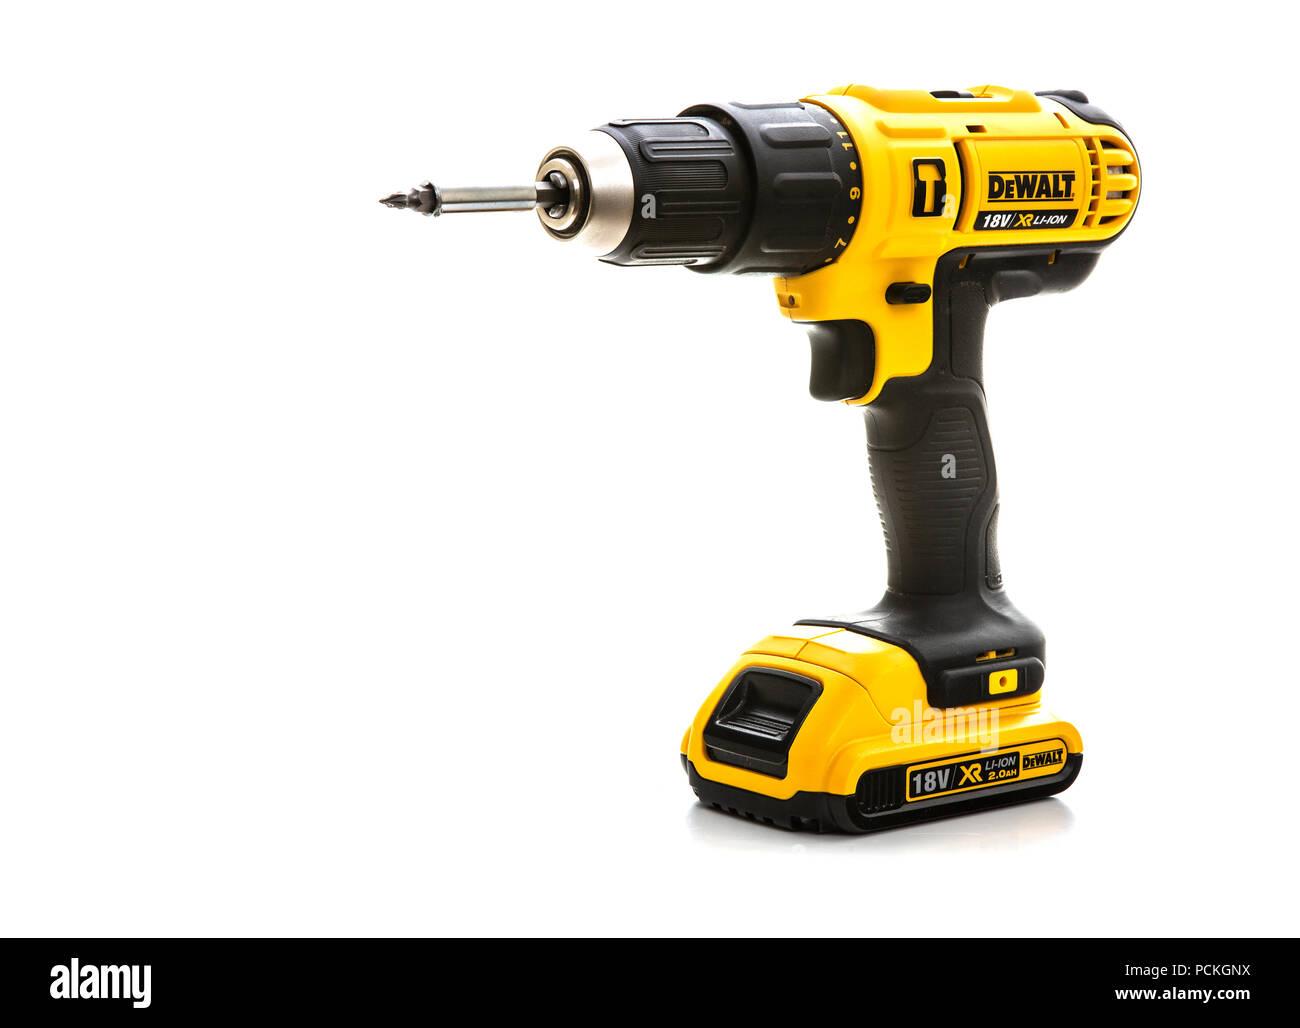 SWINDON, UK - JULY 31, 2018: DeWalt cordless power drill on a white background - Stock Image